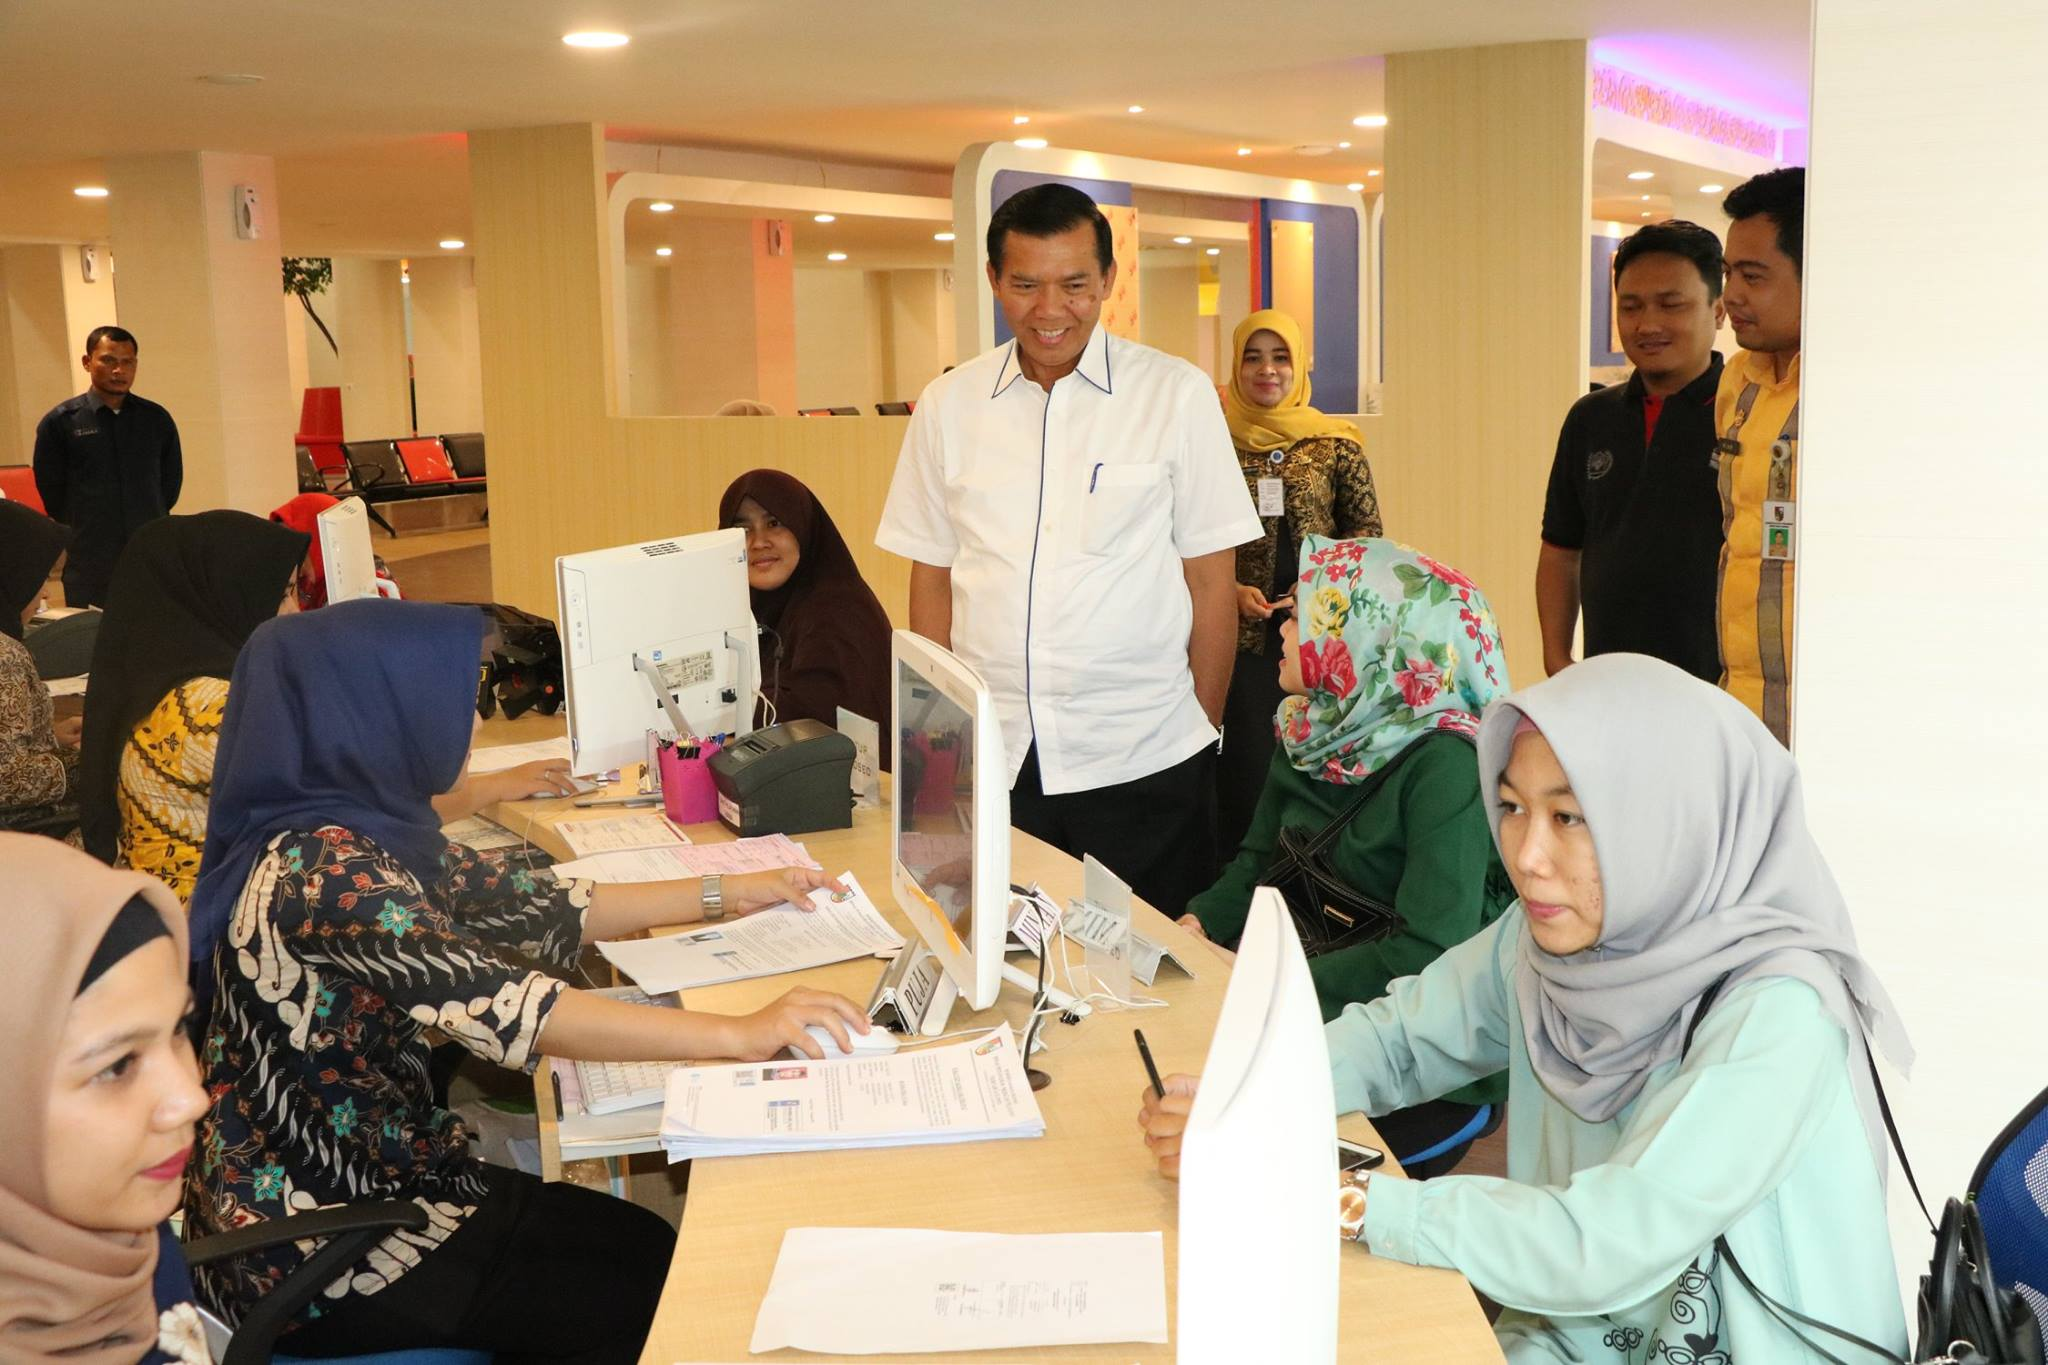 Wali Kota Pekanbaru Tinjau Pelayanan Publik di MPP